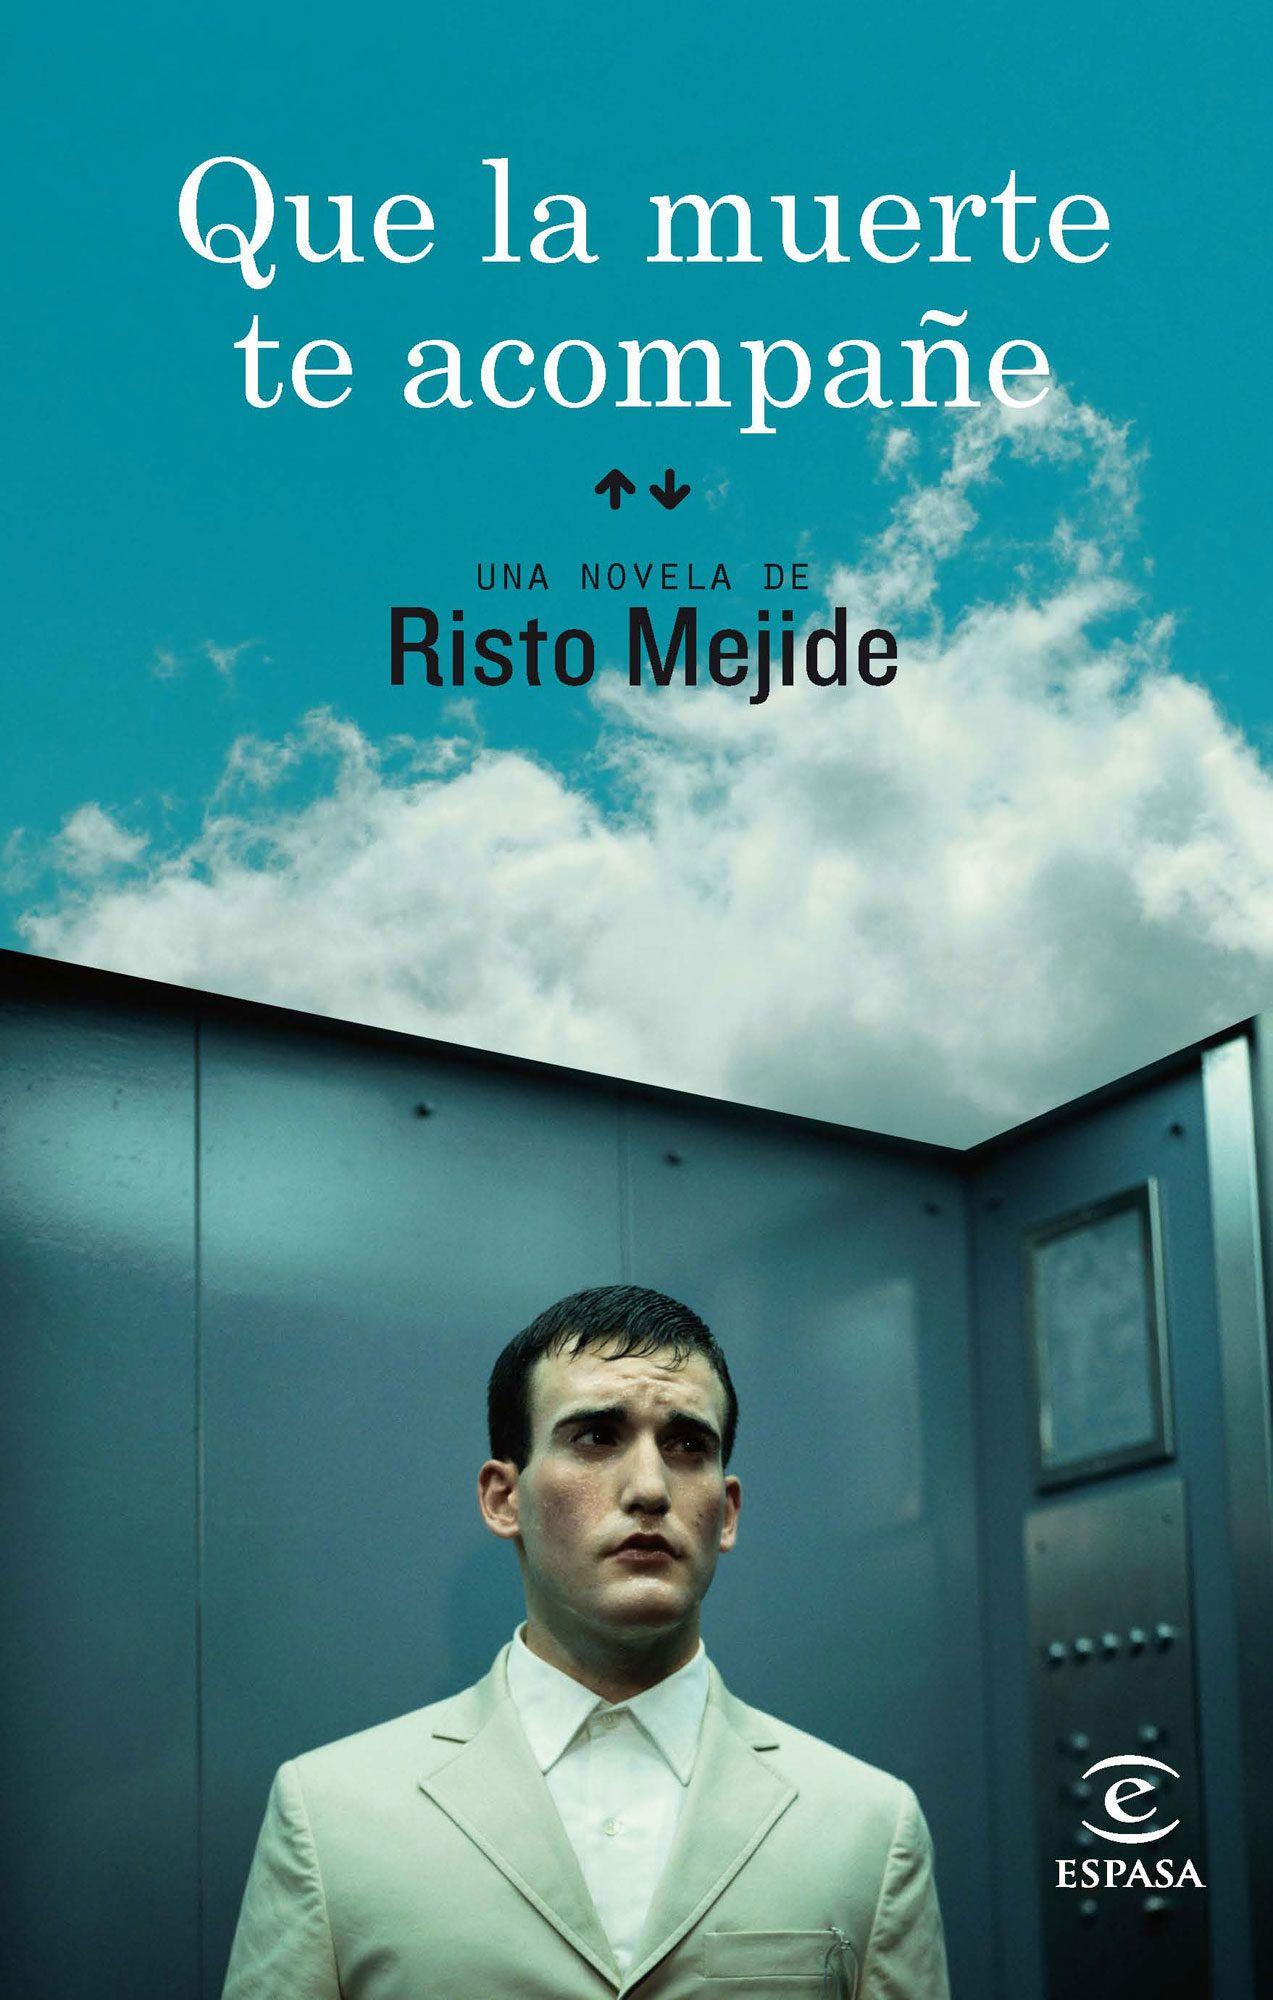 Descarga Que La Muerte Te Acompane Risto Mejide Https Ift Tt 2zs0yb1 Libros Gratis Libros Recomendados Libros